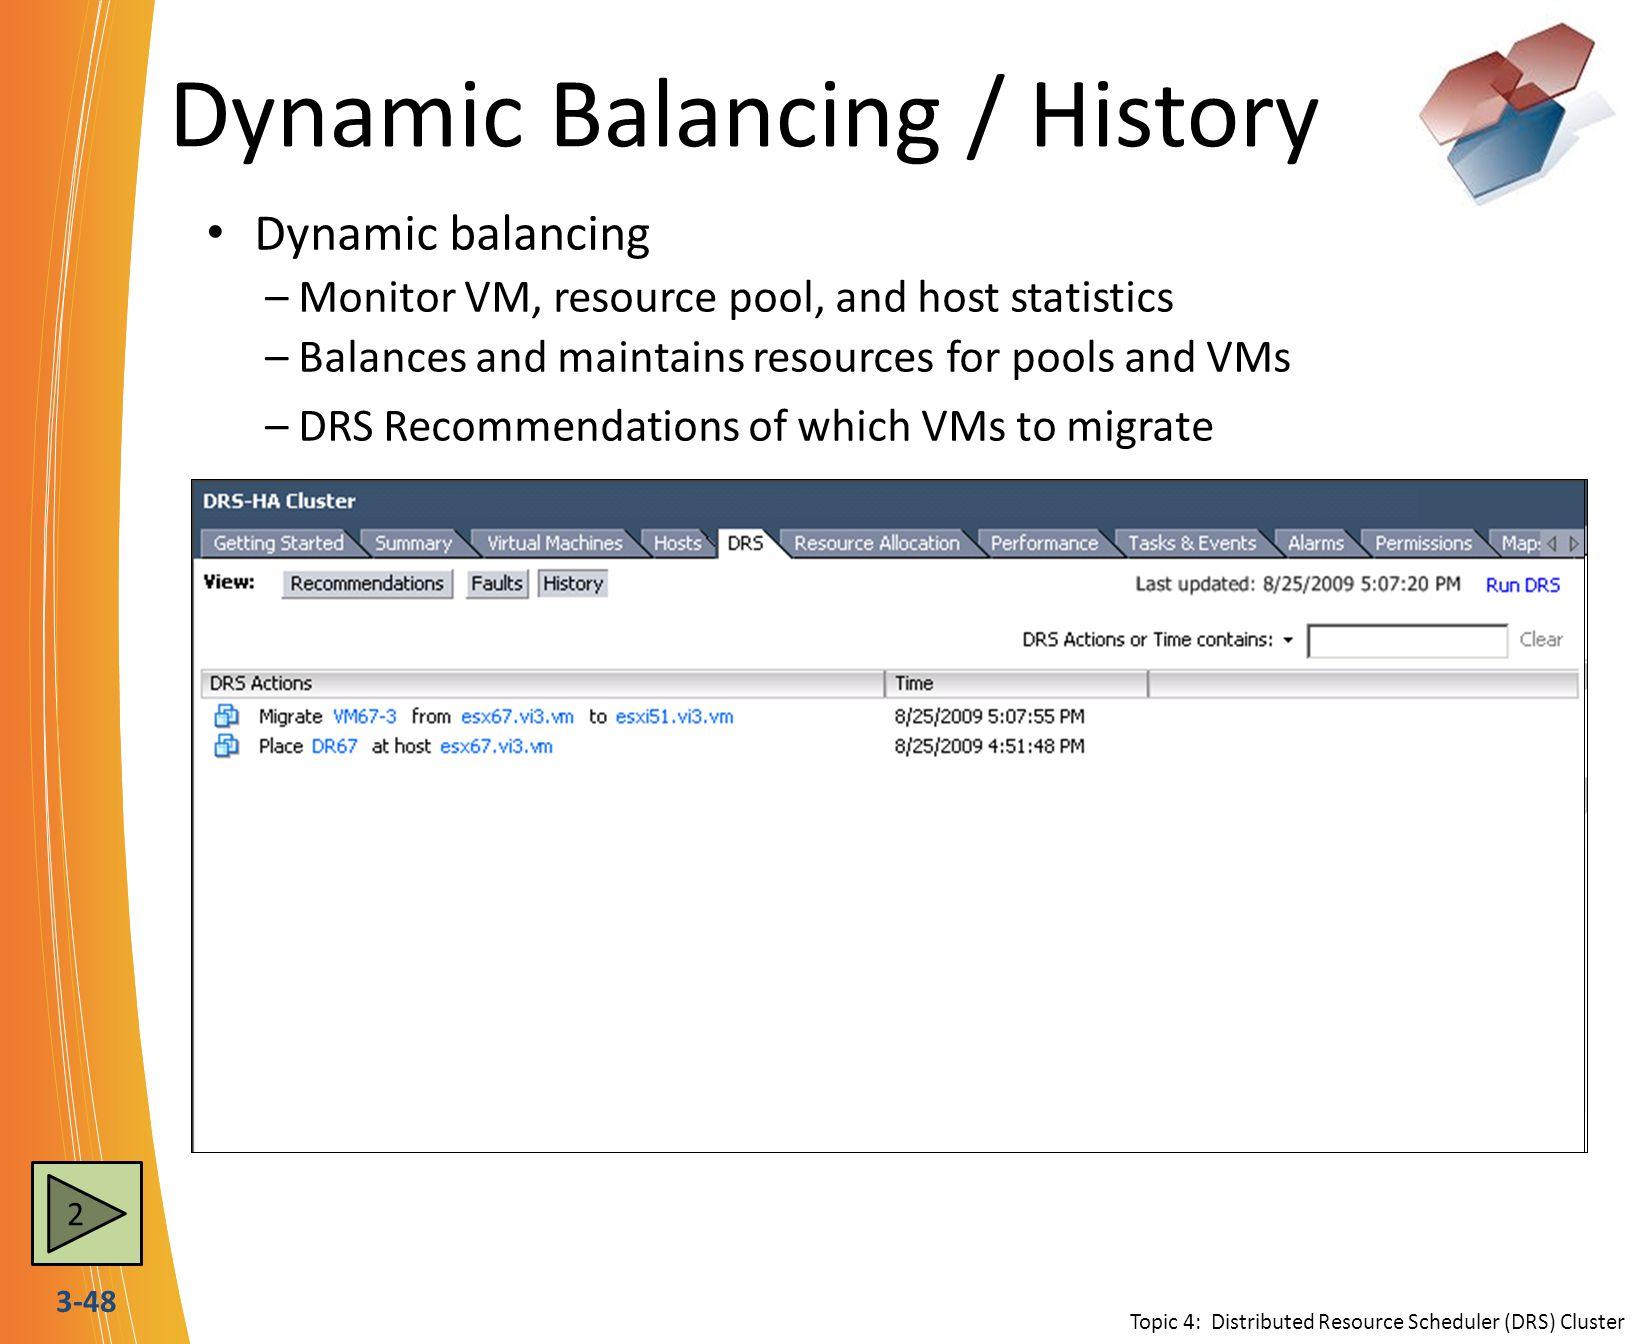 3-48 Dynamic Balancing / History Dynamic balancing –Monitor VM, resource pool, and host statistics –Balances and maintains resources for pools and VMs